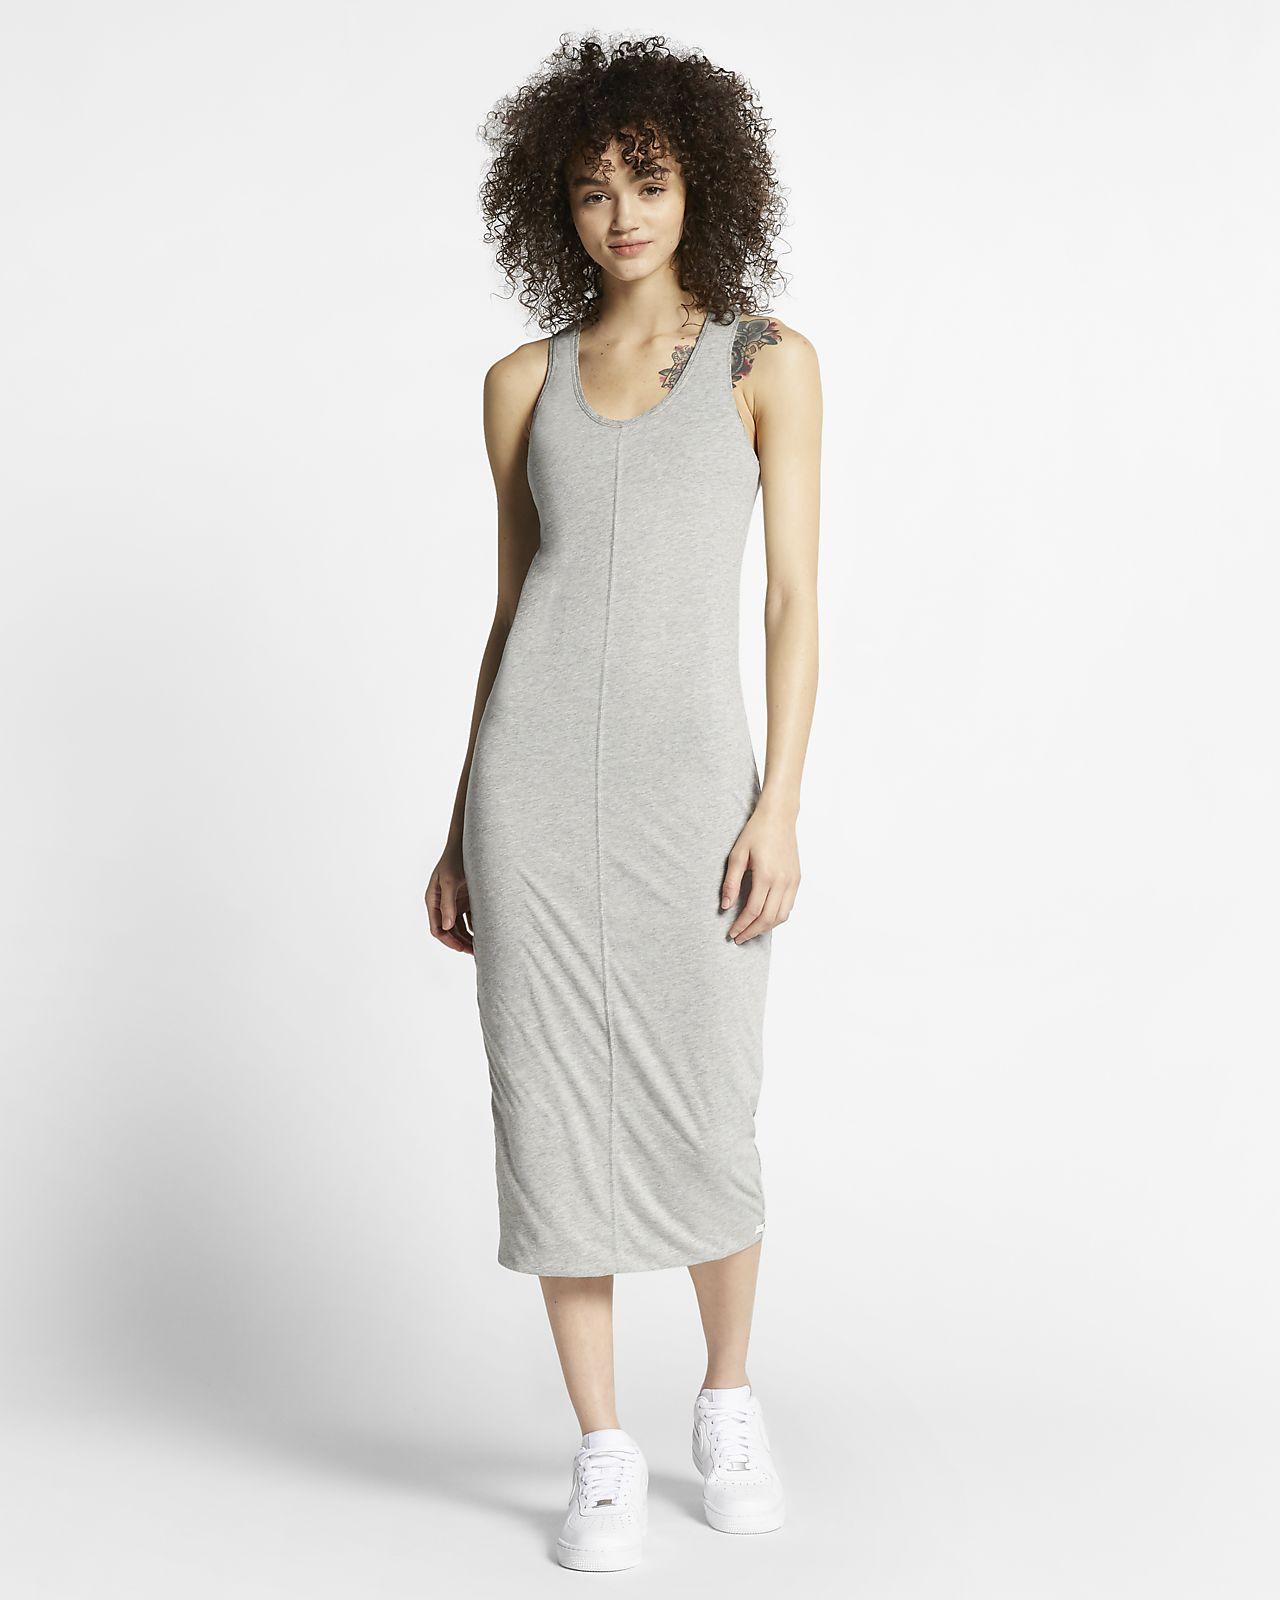 Hurley Dri-FIT női ruha